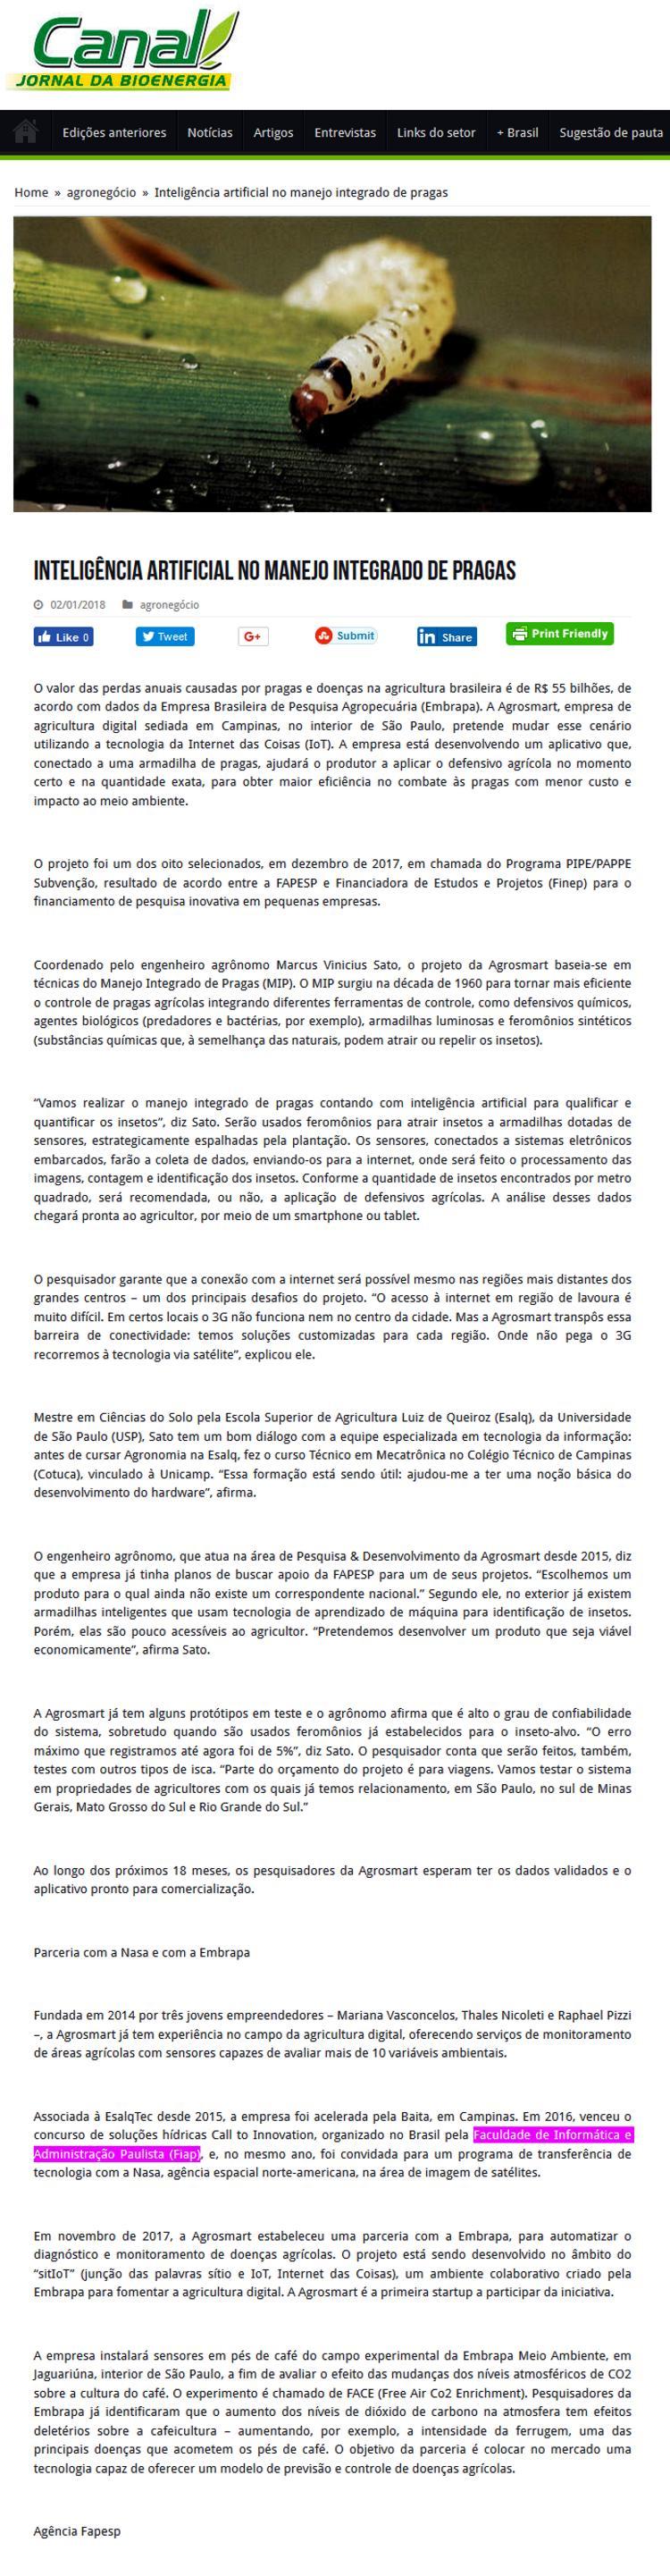 0102-Portal Canal Jornal da Bioenergia